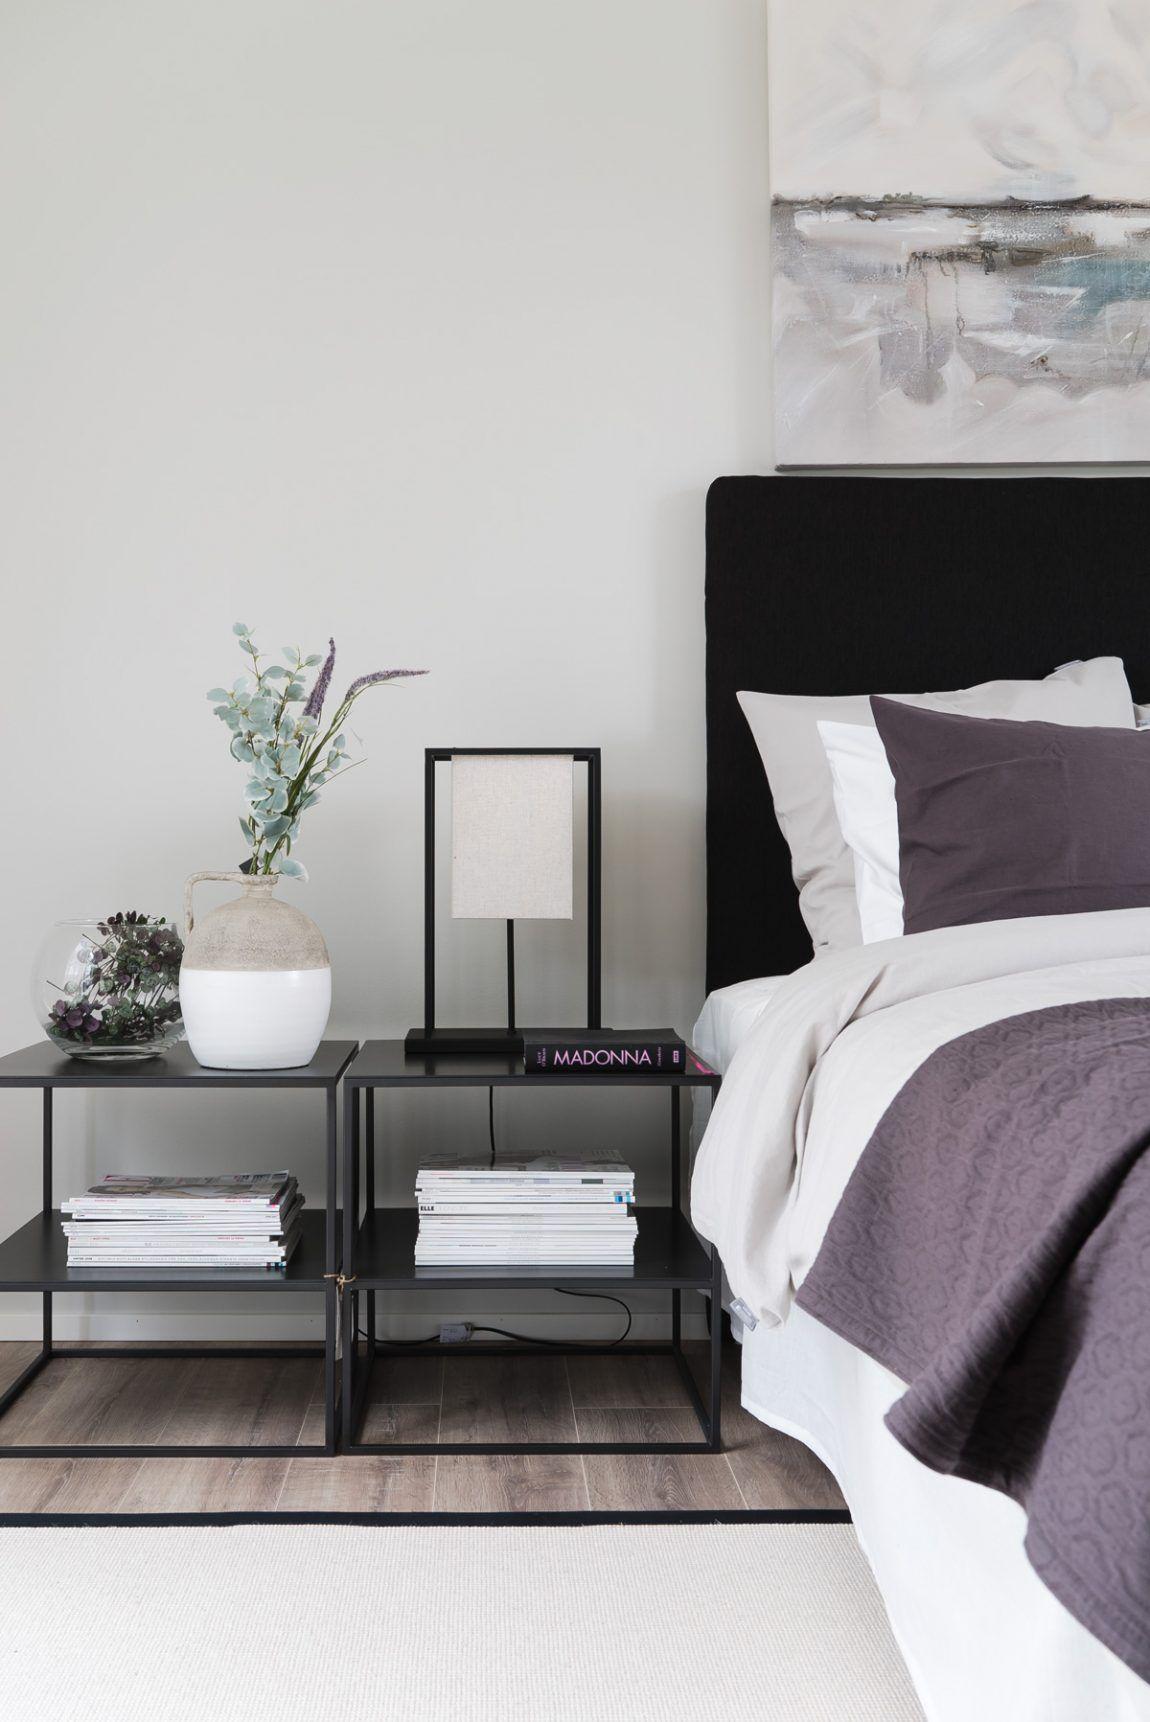 2 bedroom interior design designtalopala  bedroom  pinterest  bedrooms interiors and